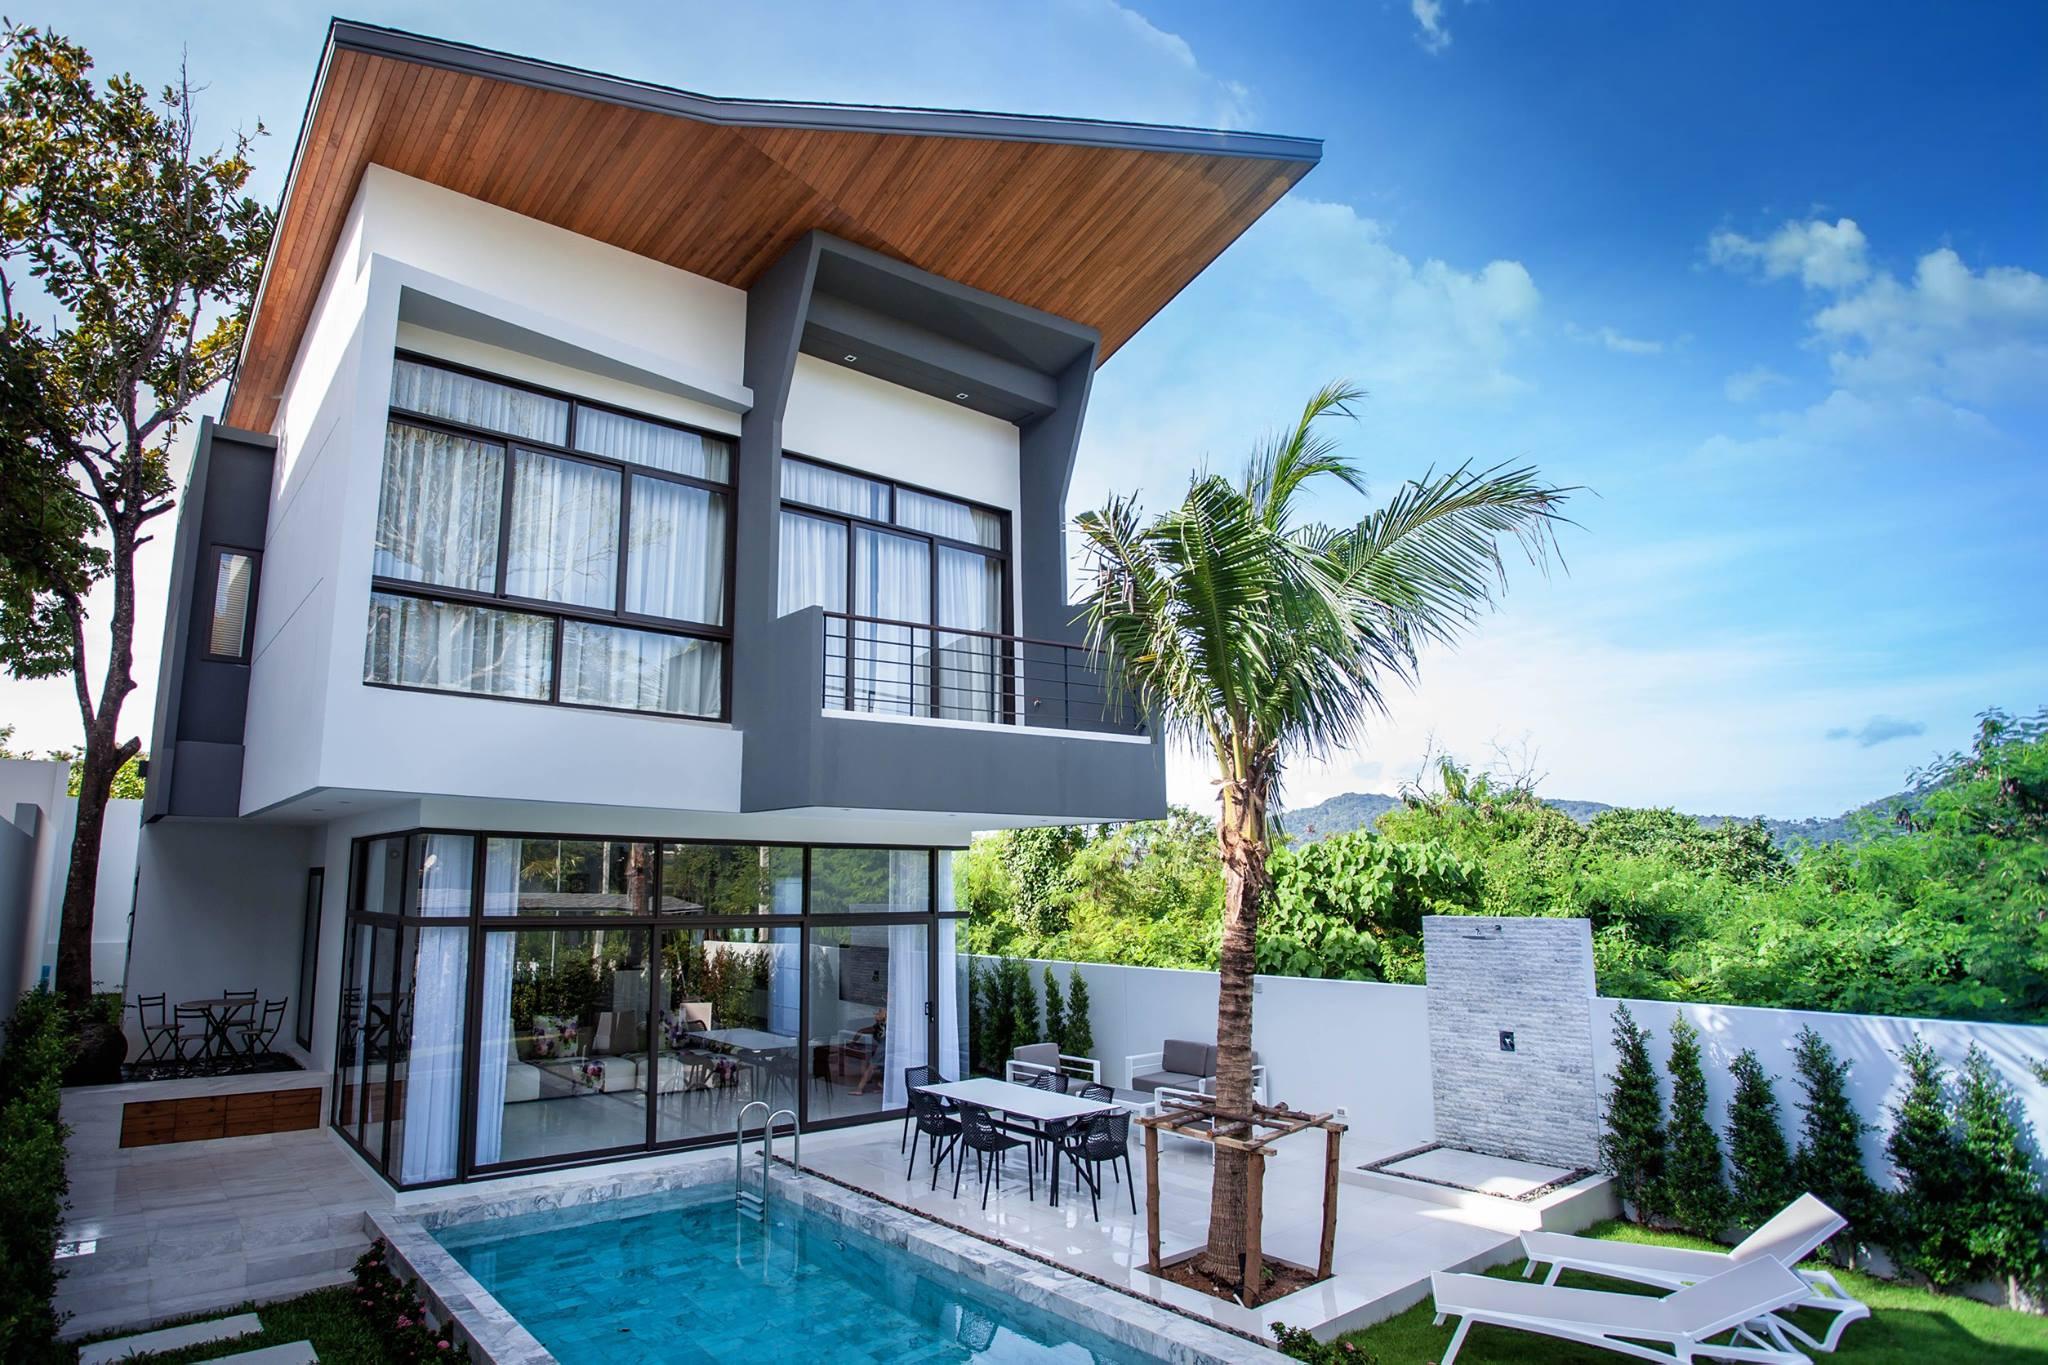 Phuket Real Estate Agency – Nai Harn Beach (15)